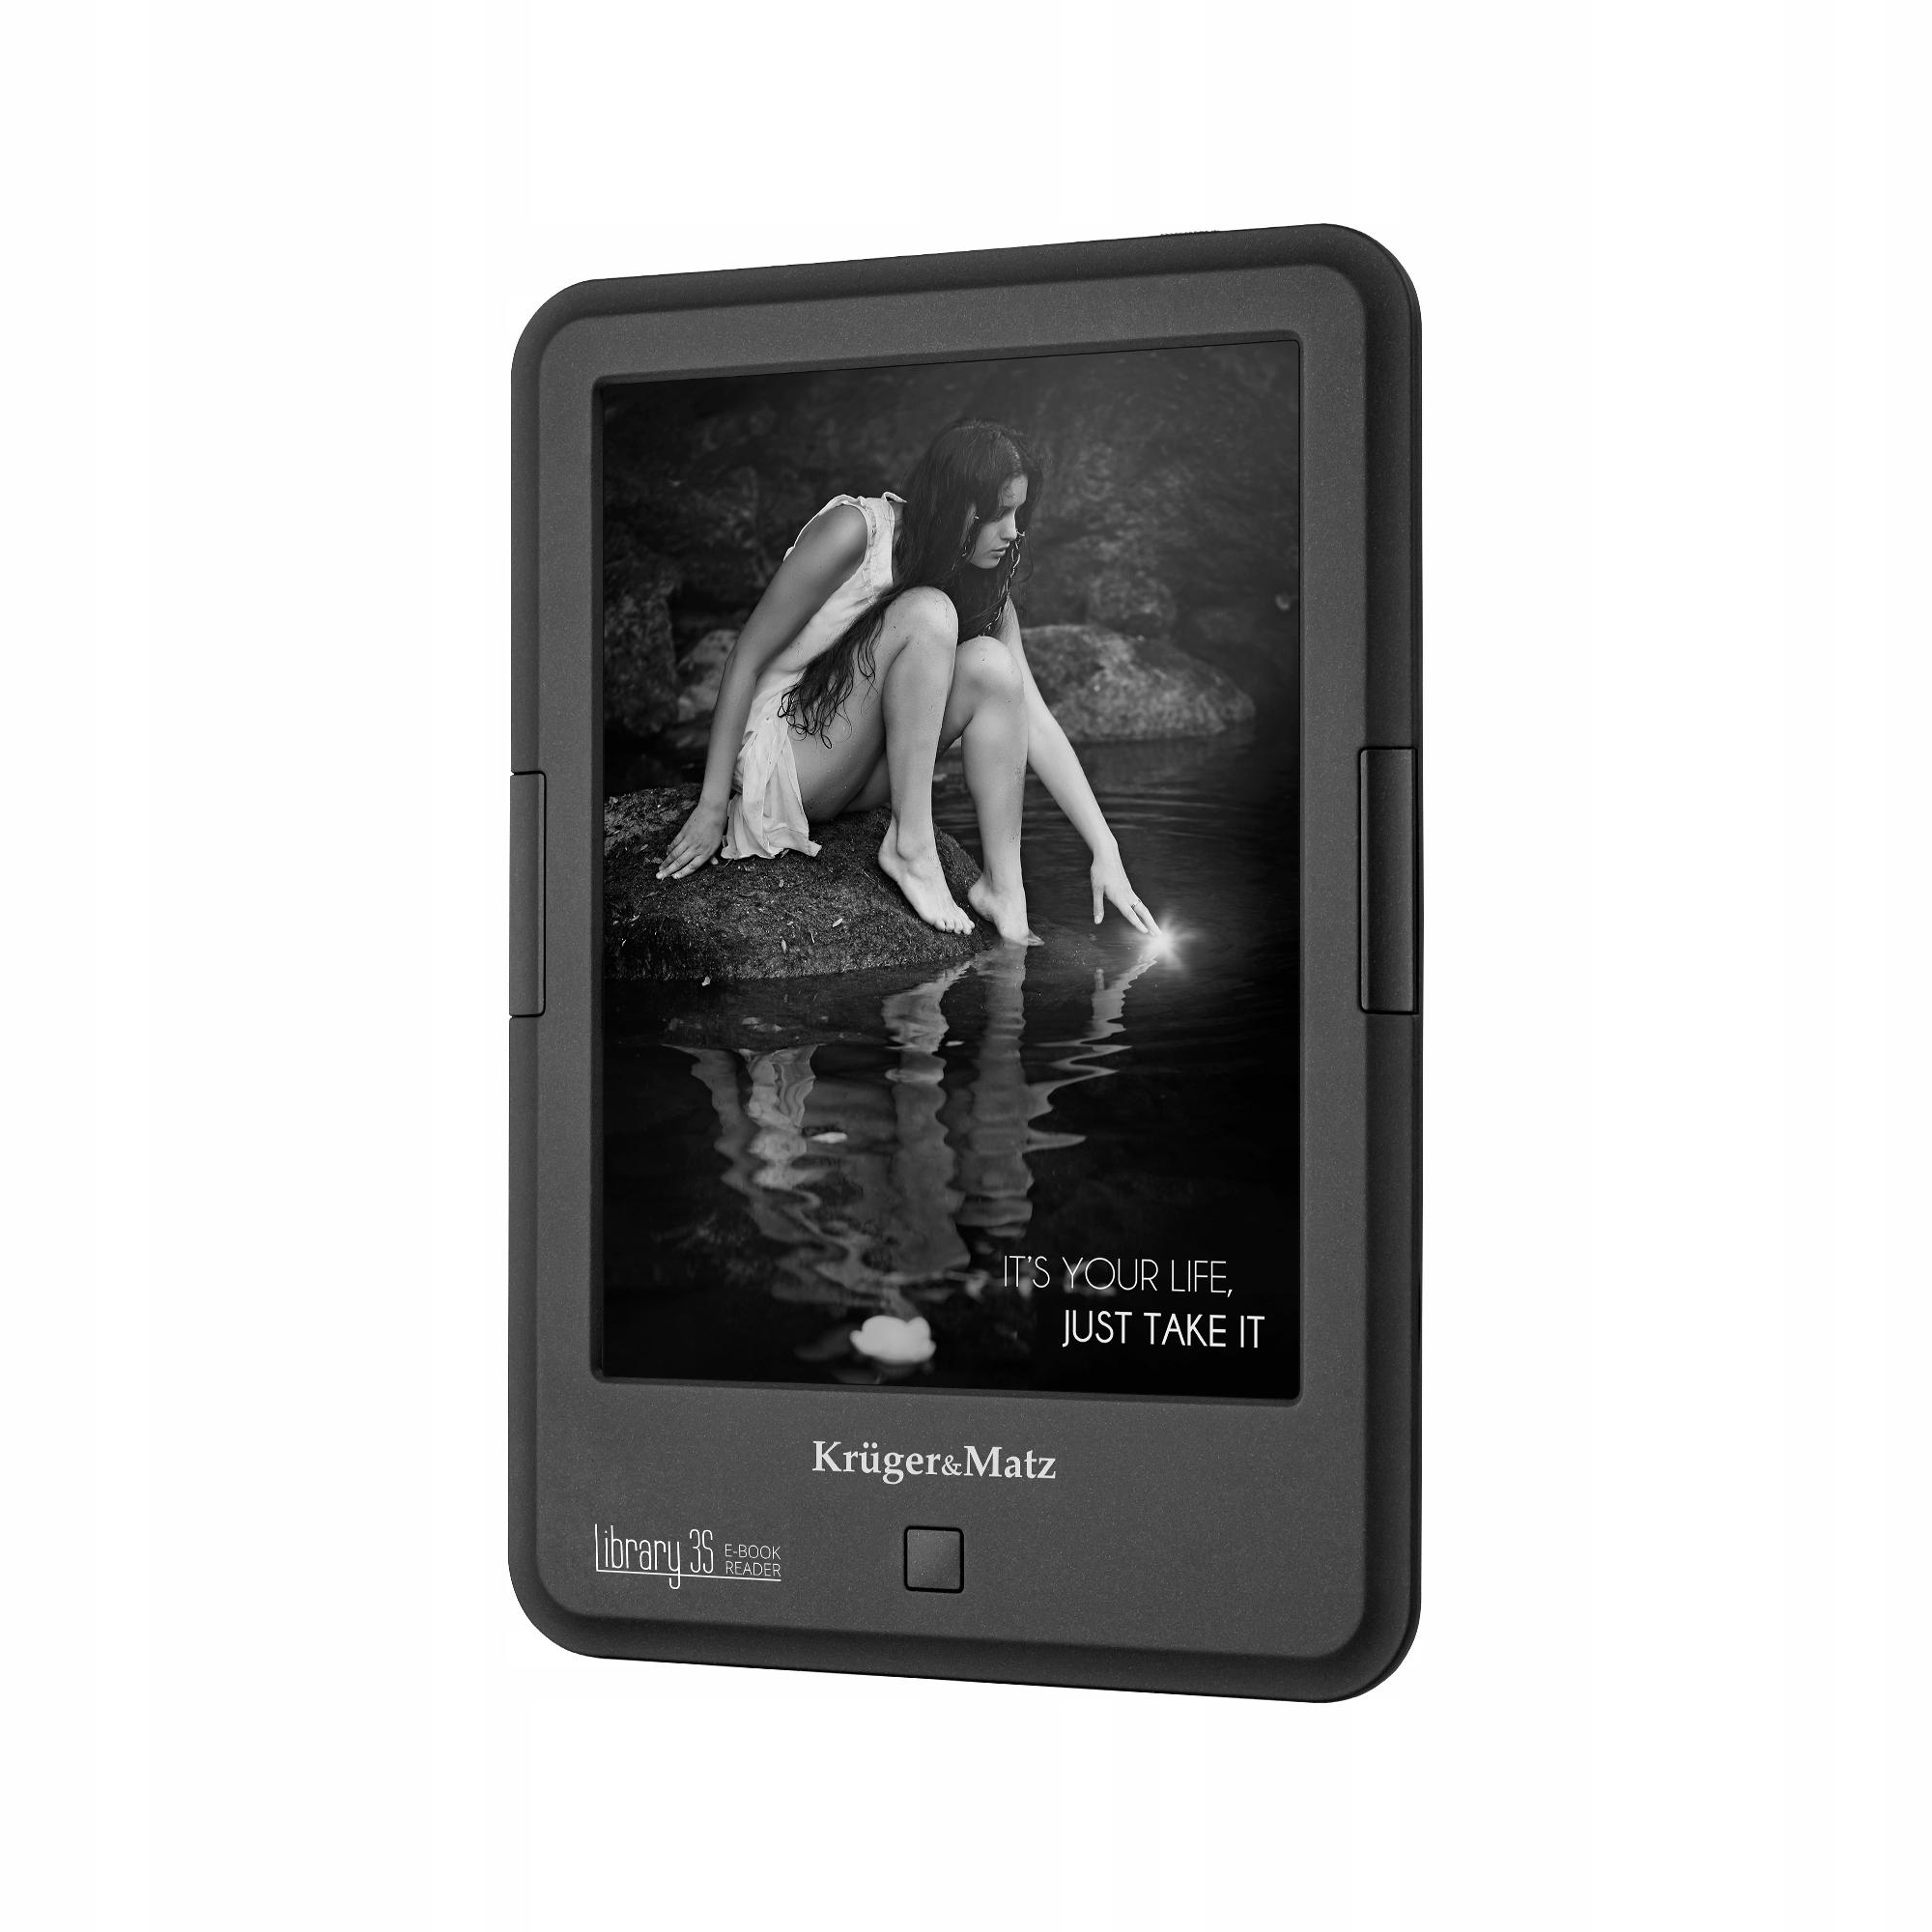 Czytnik e book Library 3S CARTA i 8GB KrugerMatz